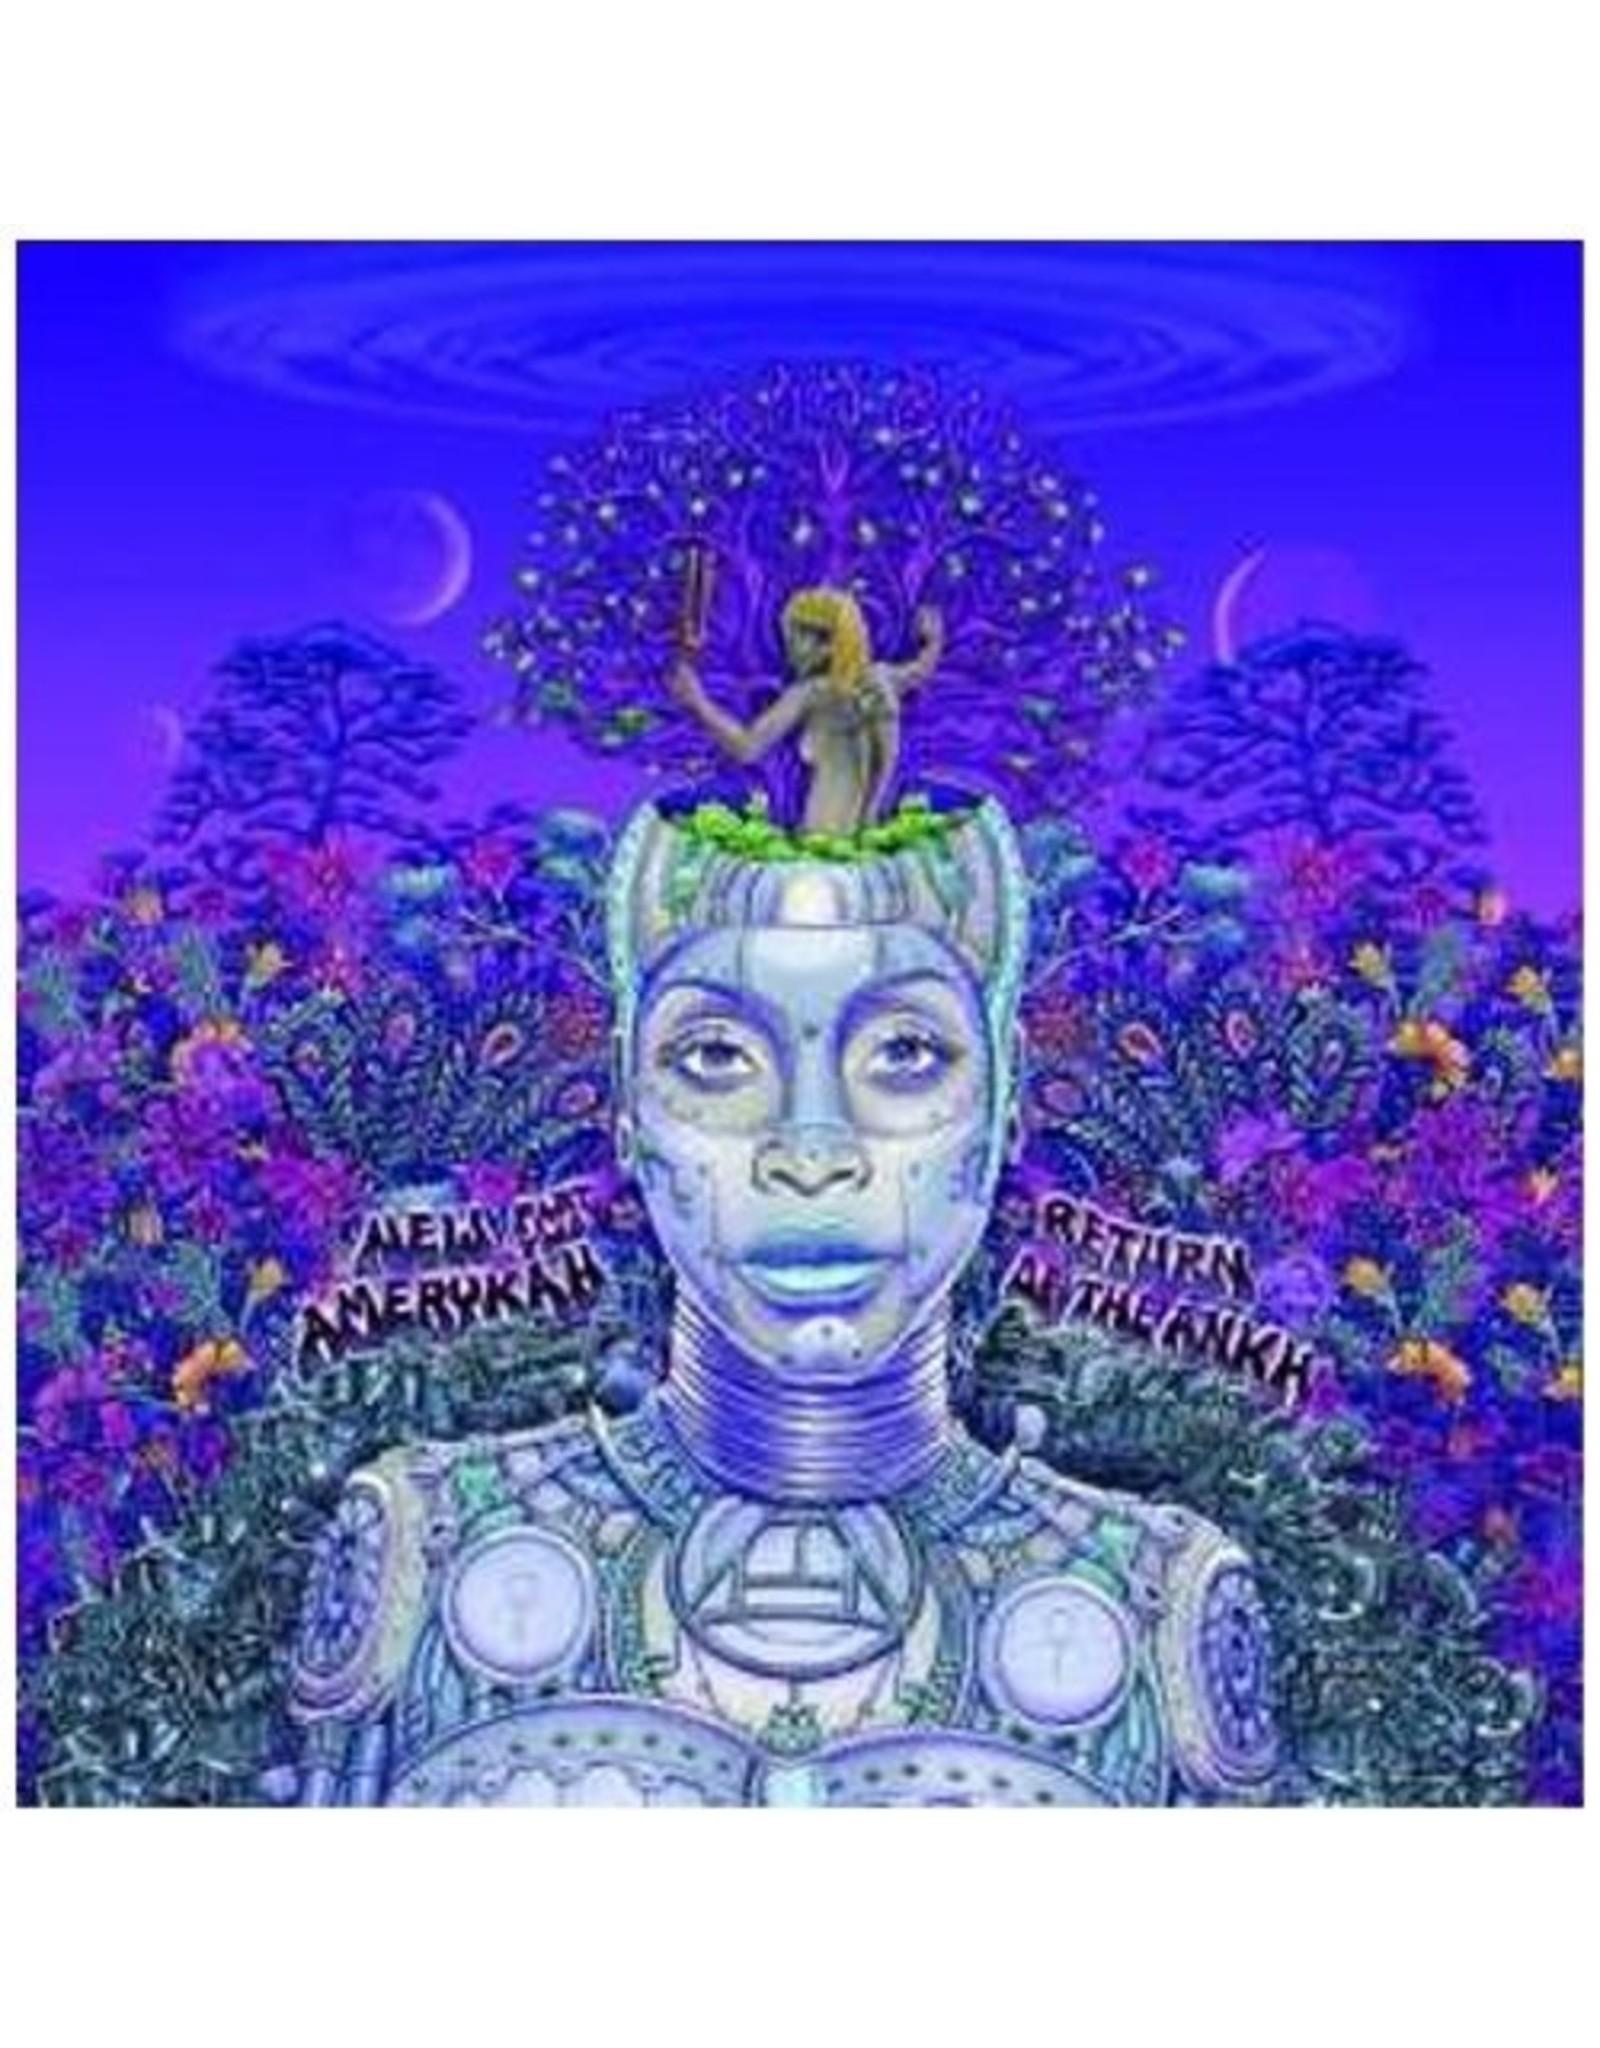 New Vinyl Erykah Badu - New Amerykah Part Two: Return Of The Ankh 2LP